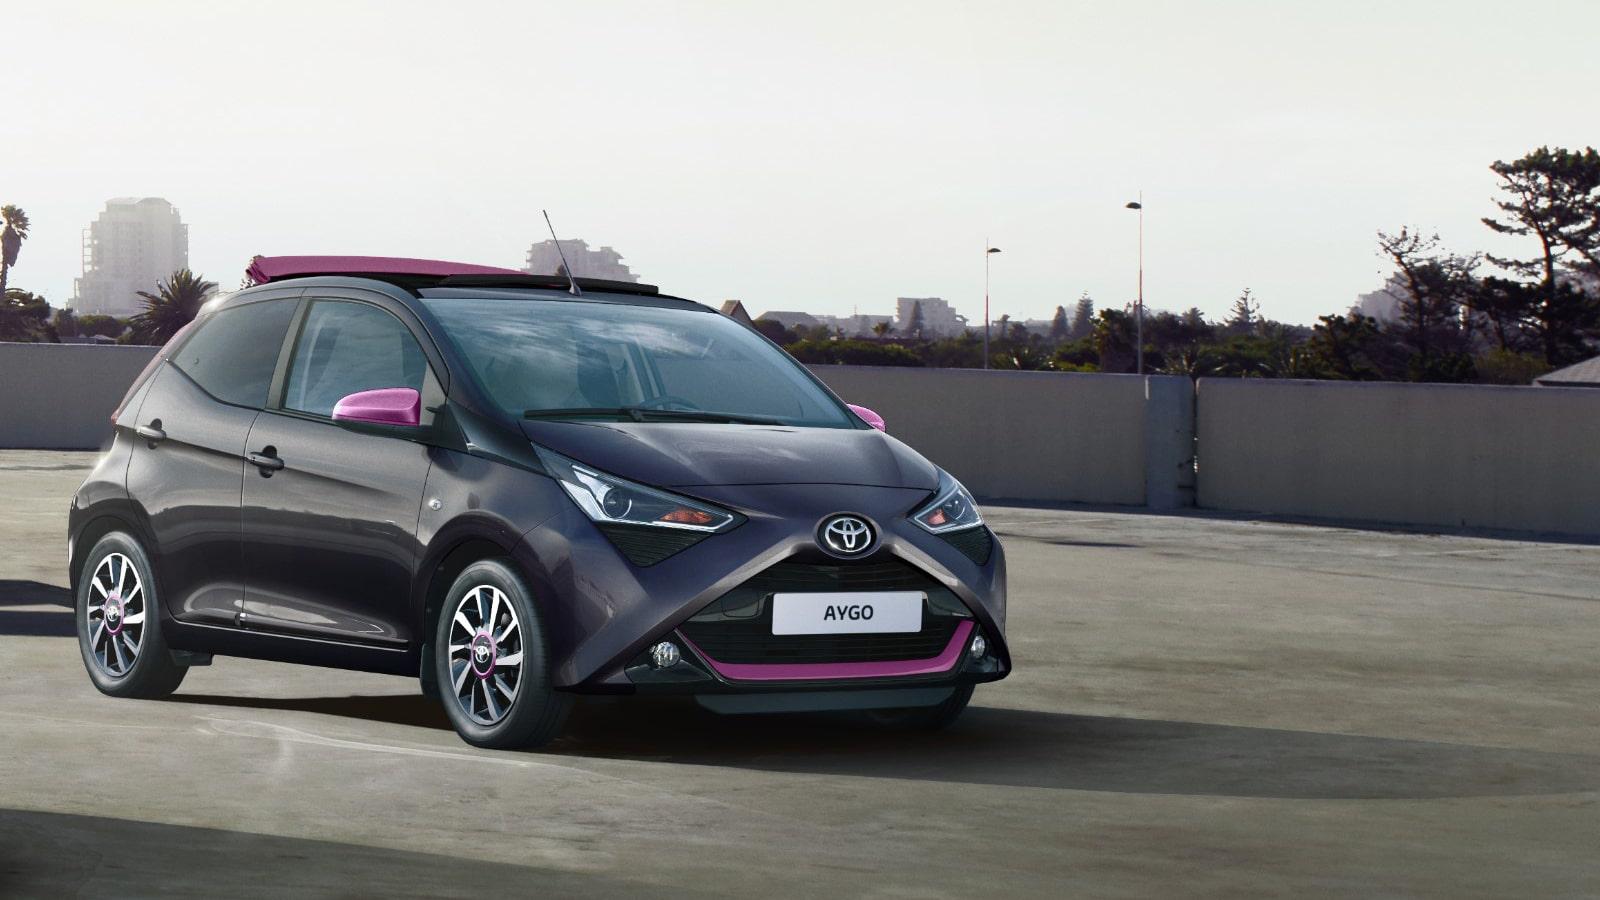 Toyota Aygo coche automático pequeño